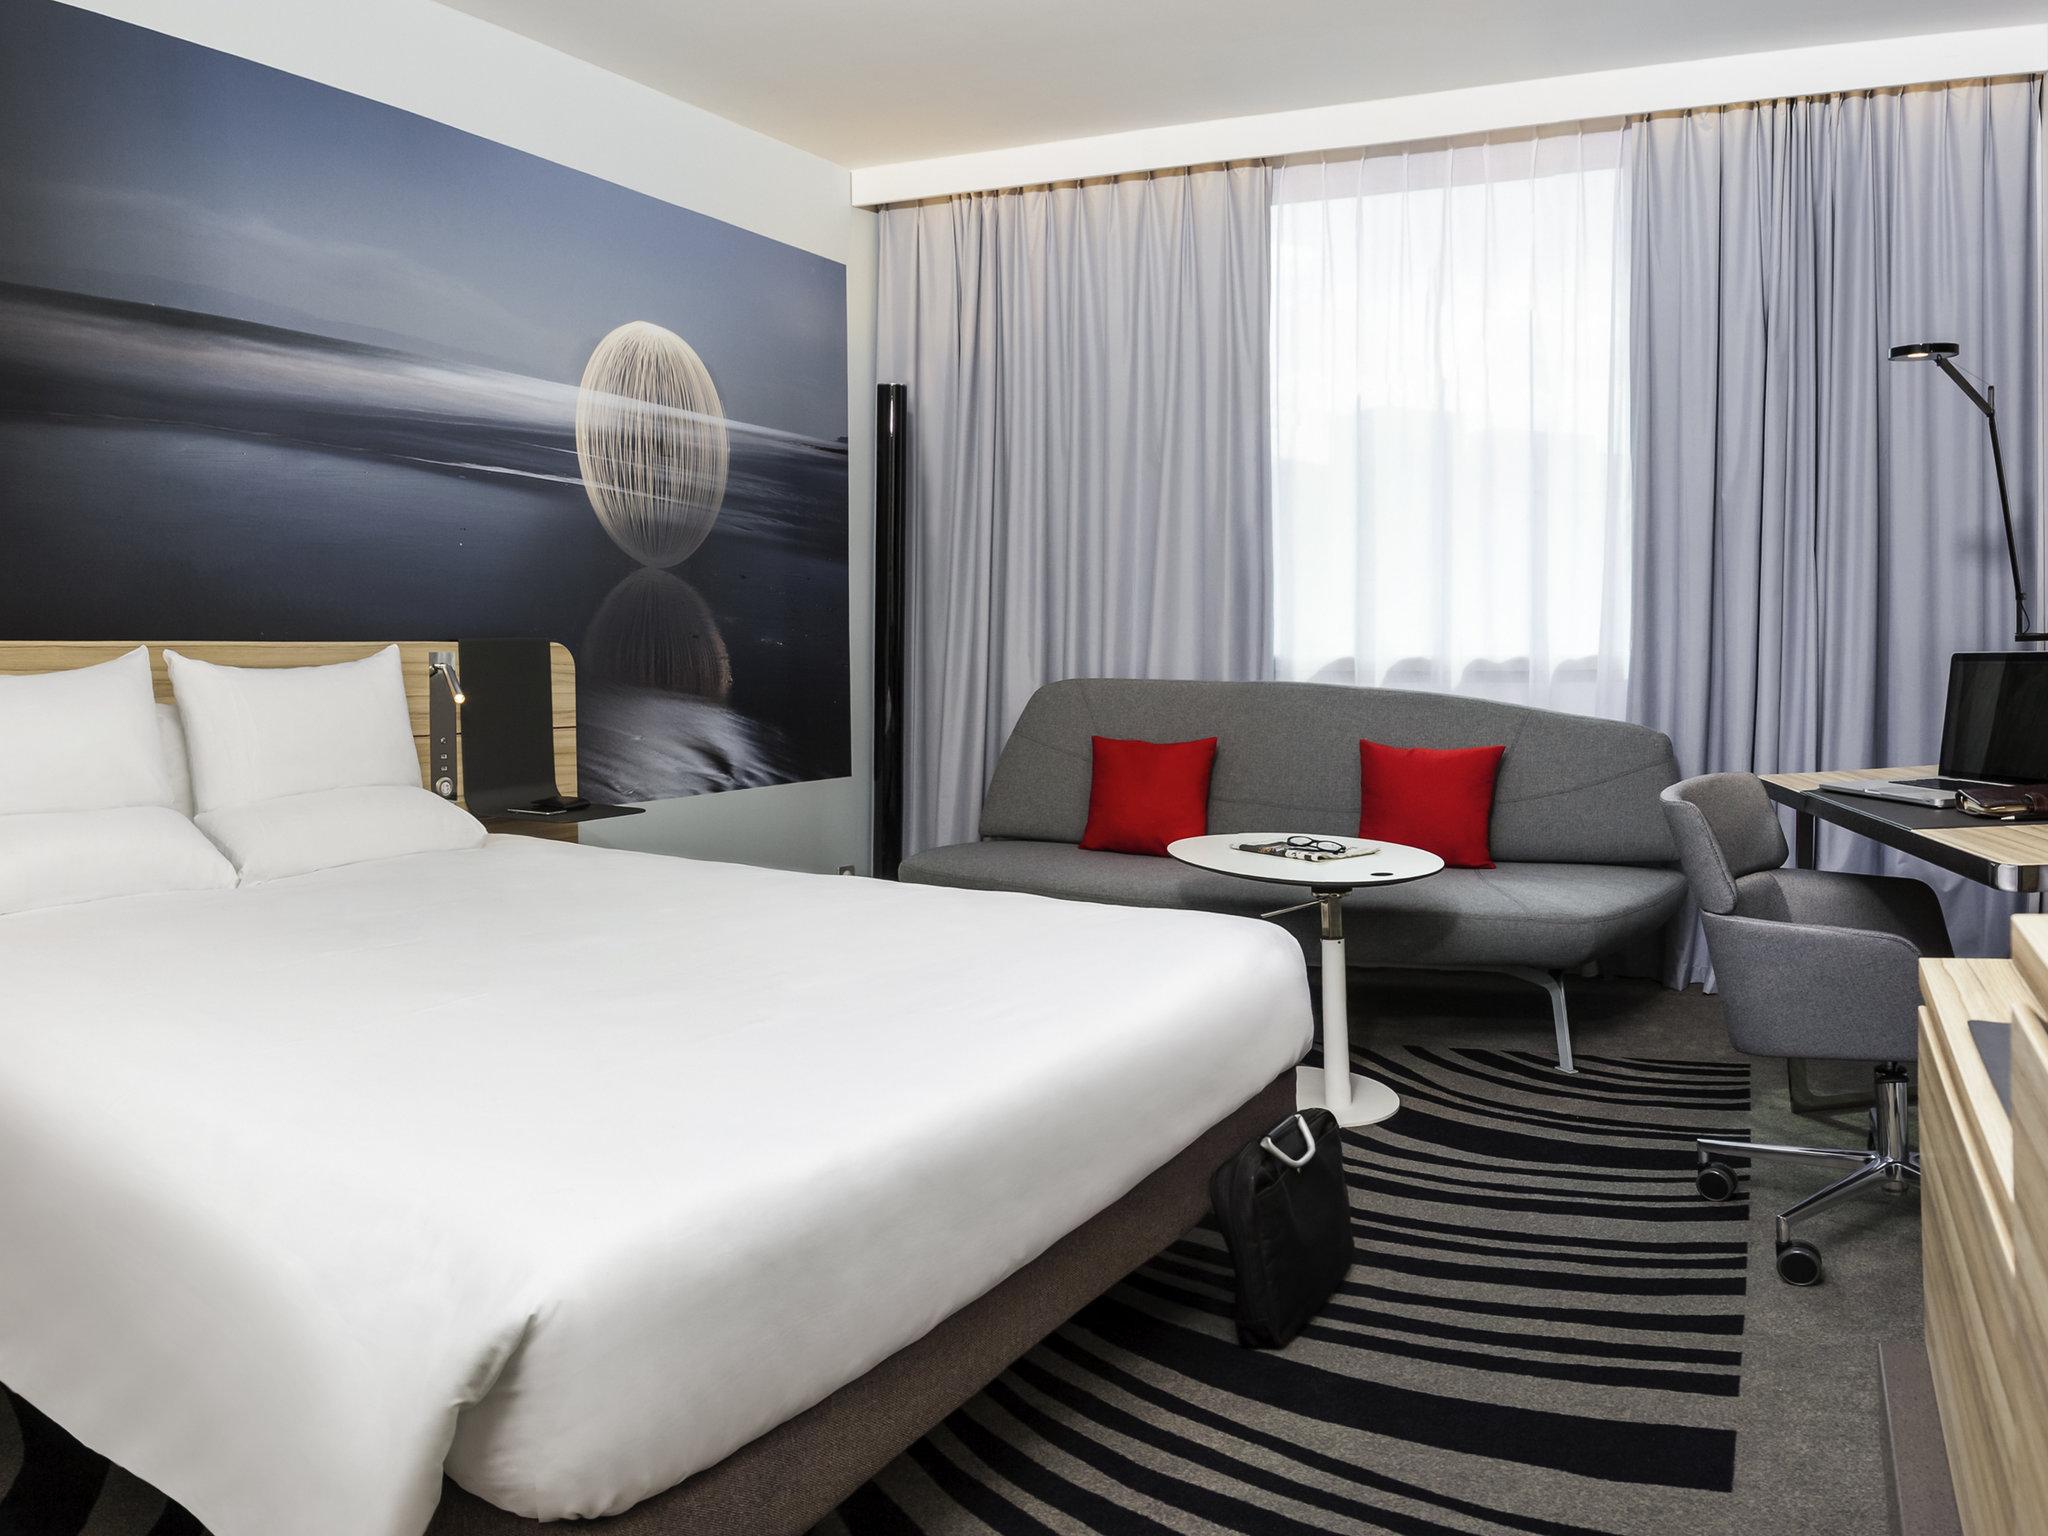 Hotel Ibis Limoge